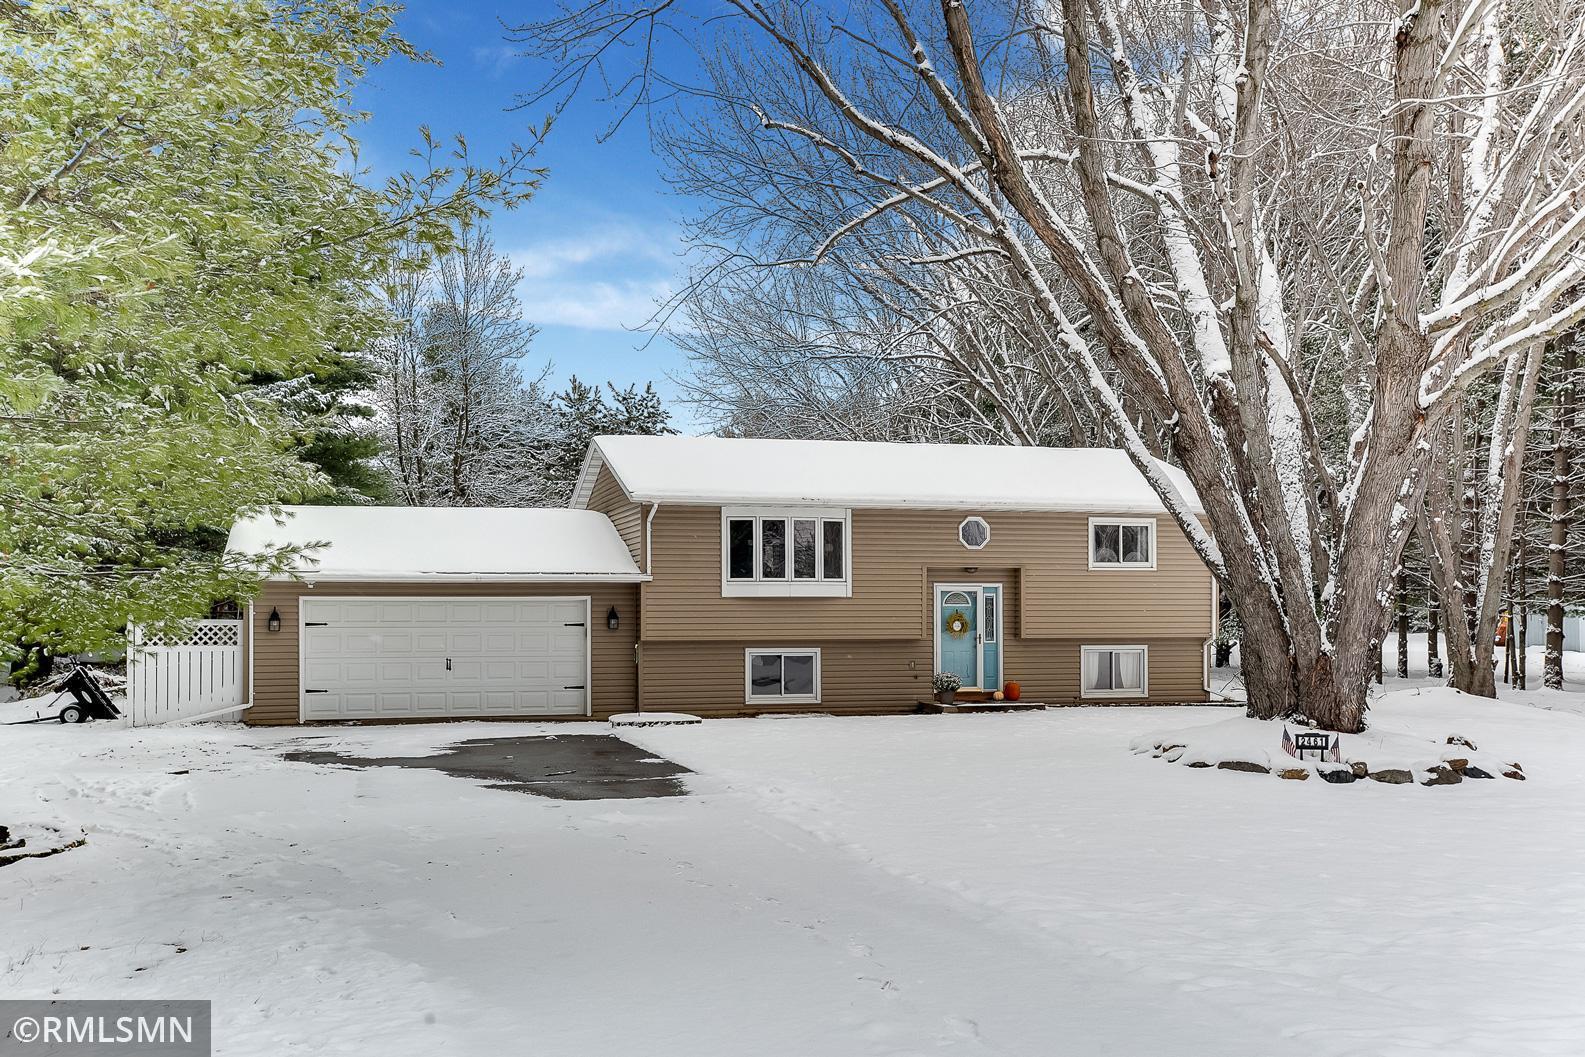 2461 225th Avenue NE Property Photo - East Bethel, MN real estate listing